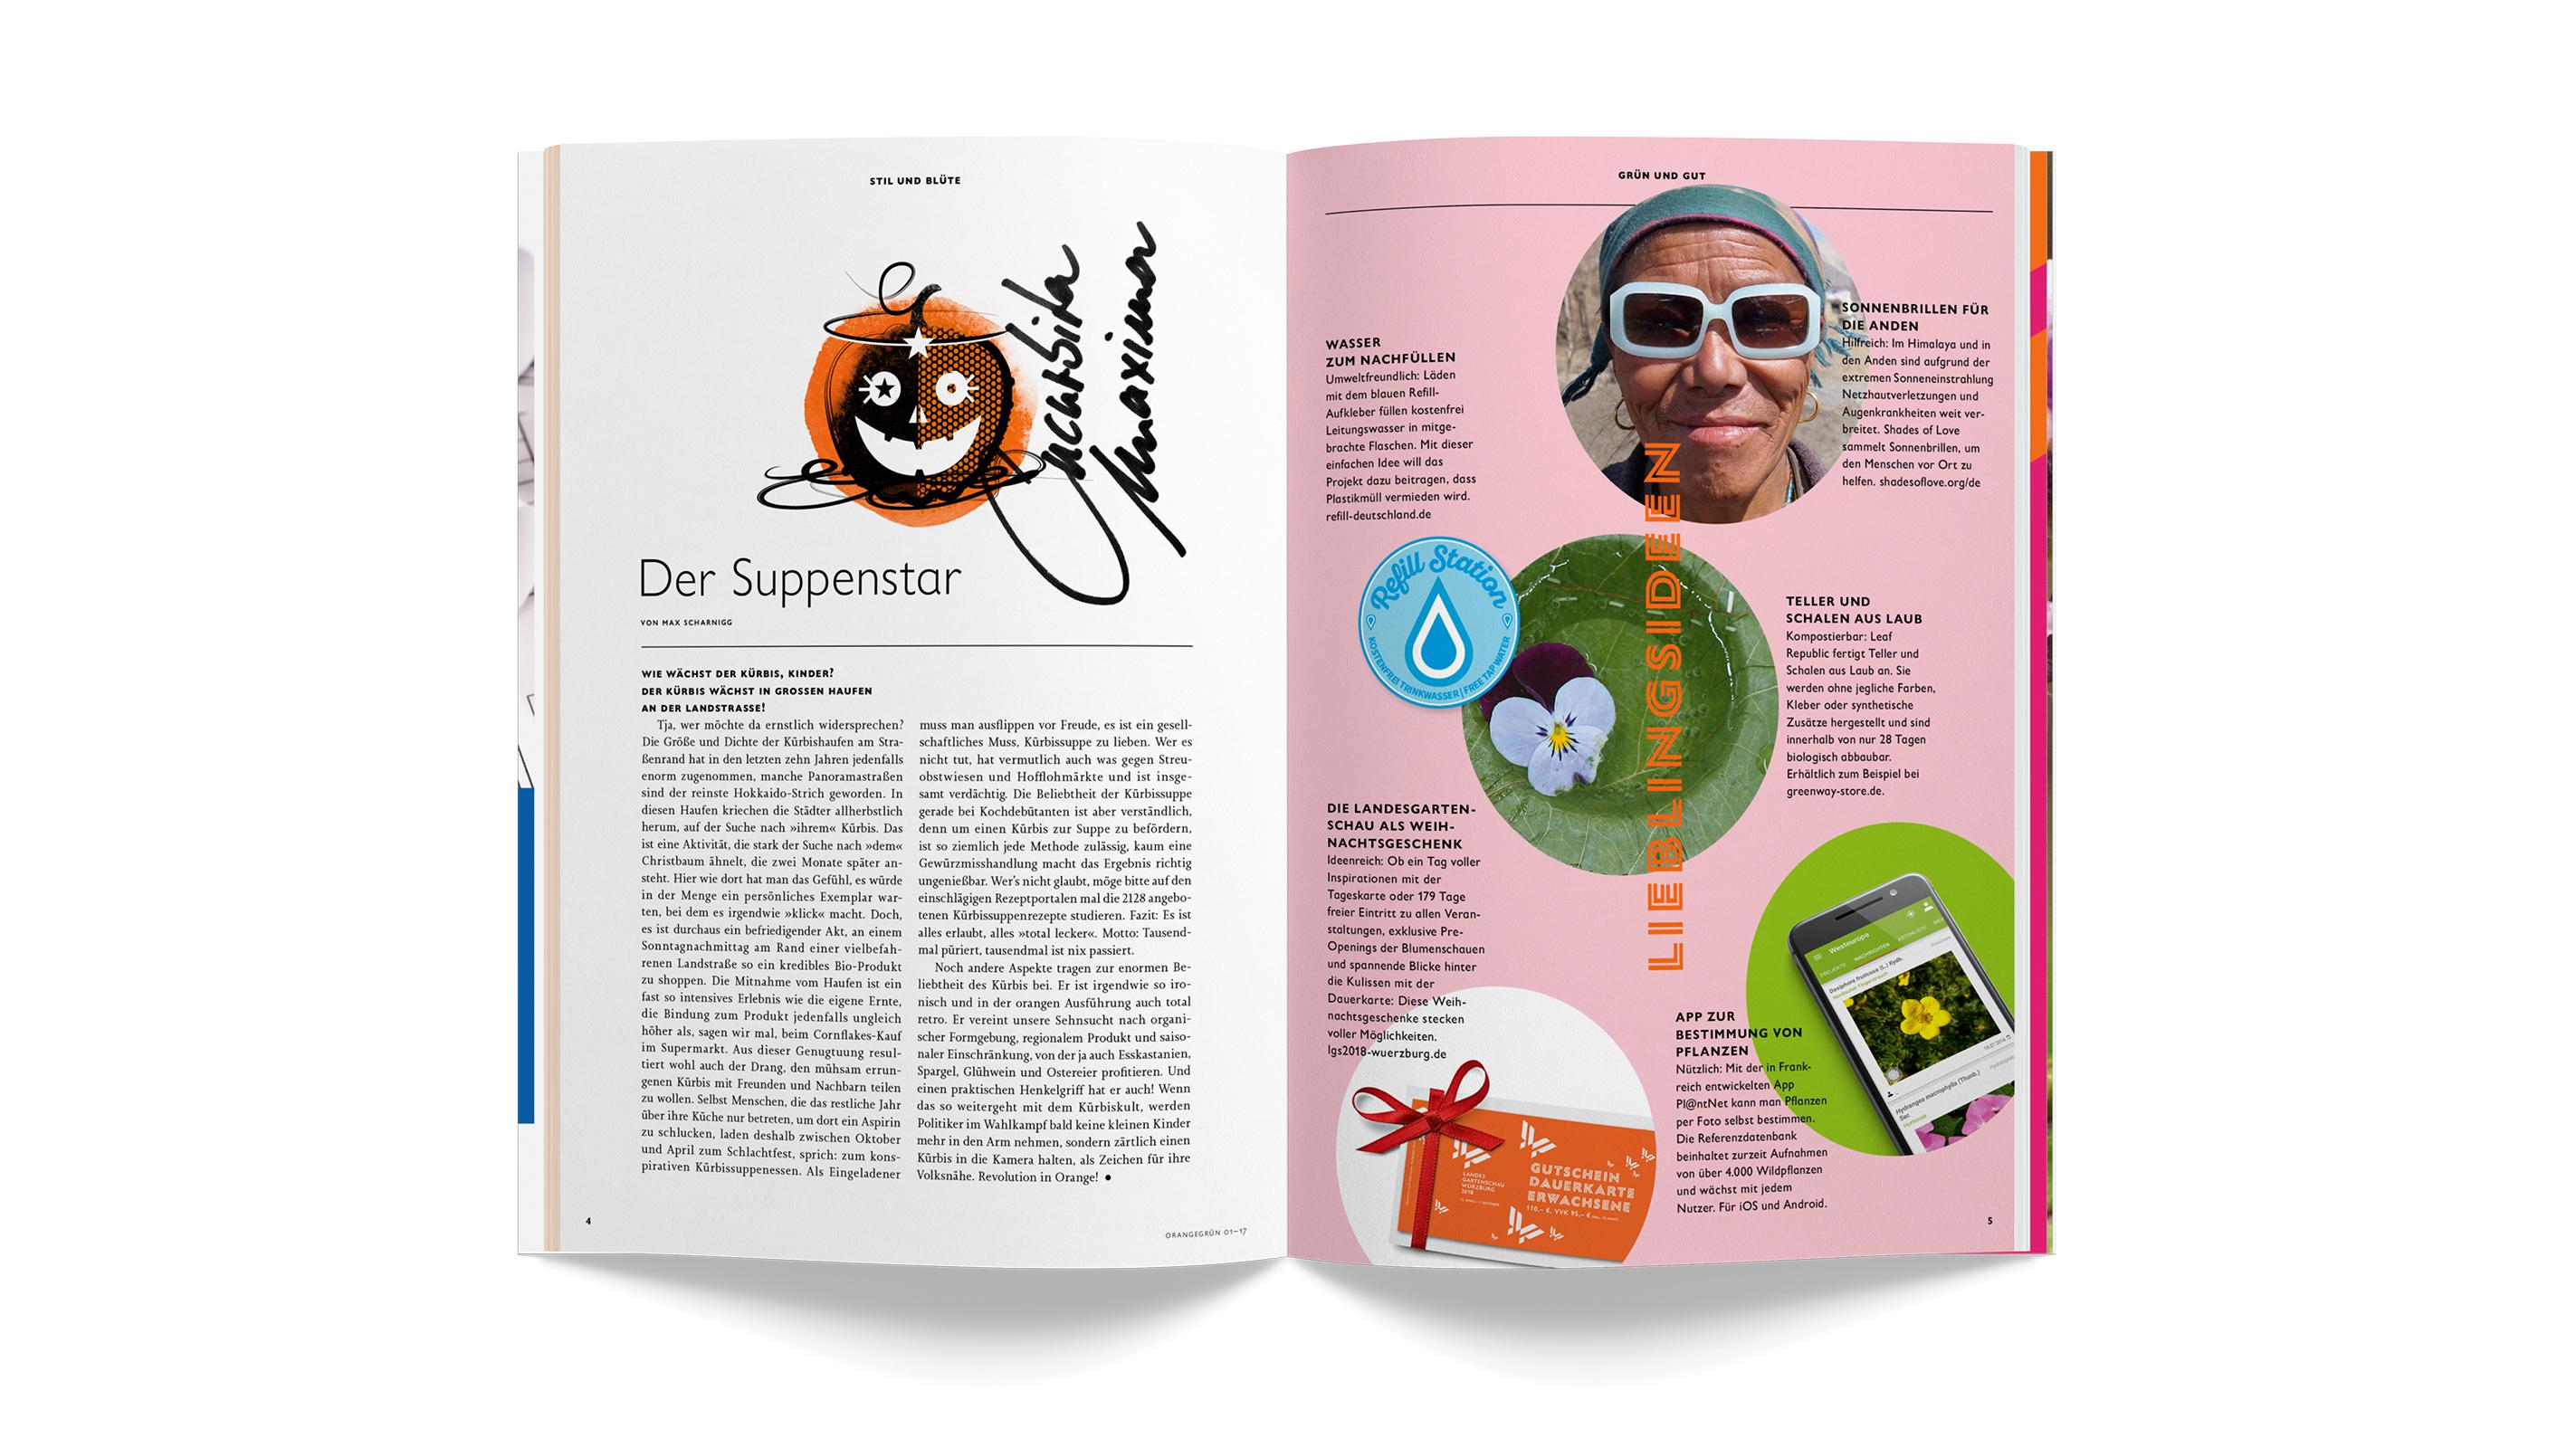 Orangegrün – Poarangan Brand Design 2560×1440 small2